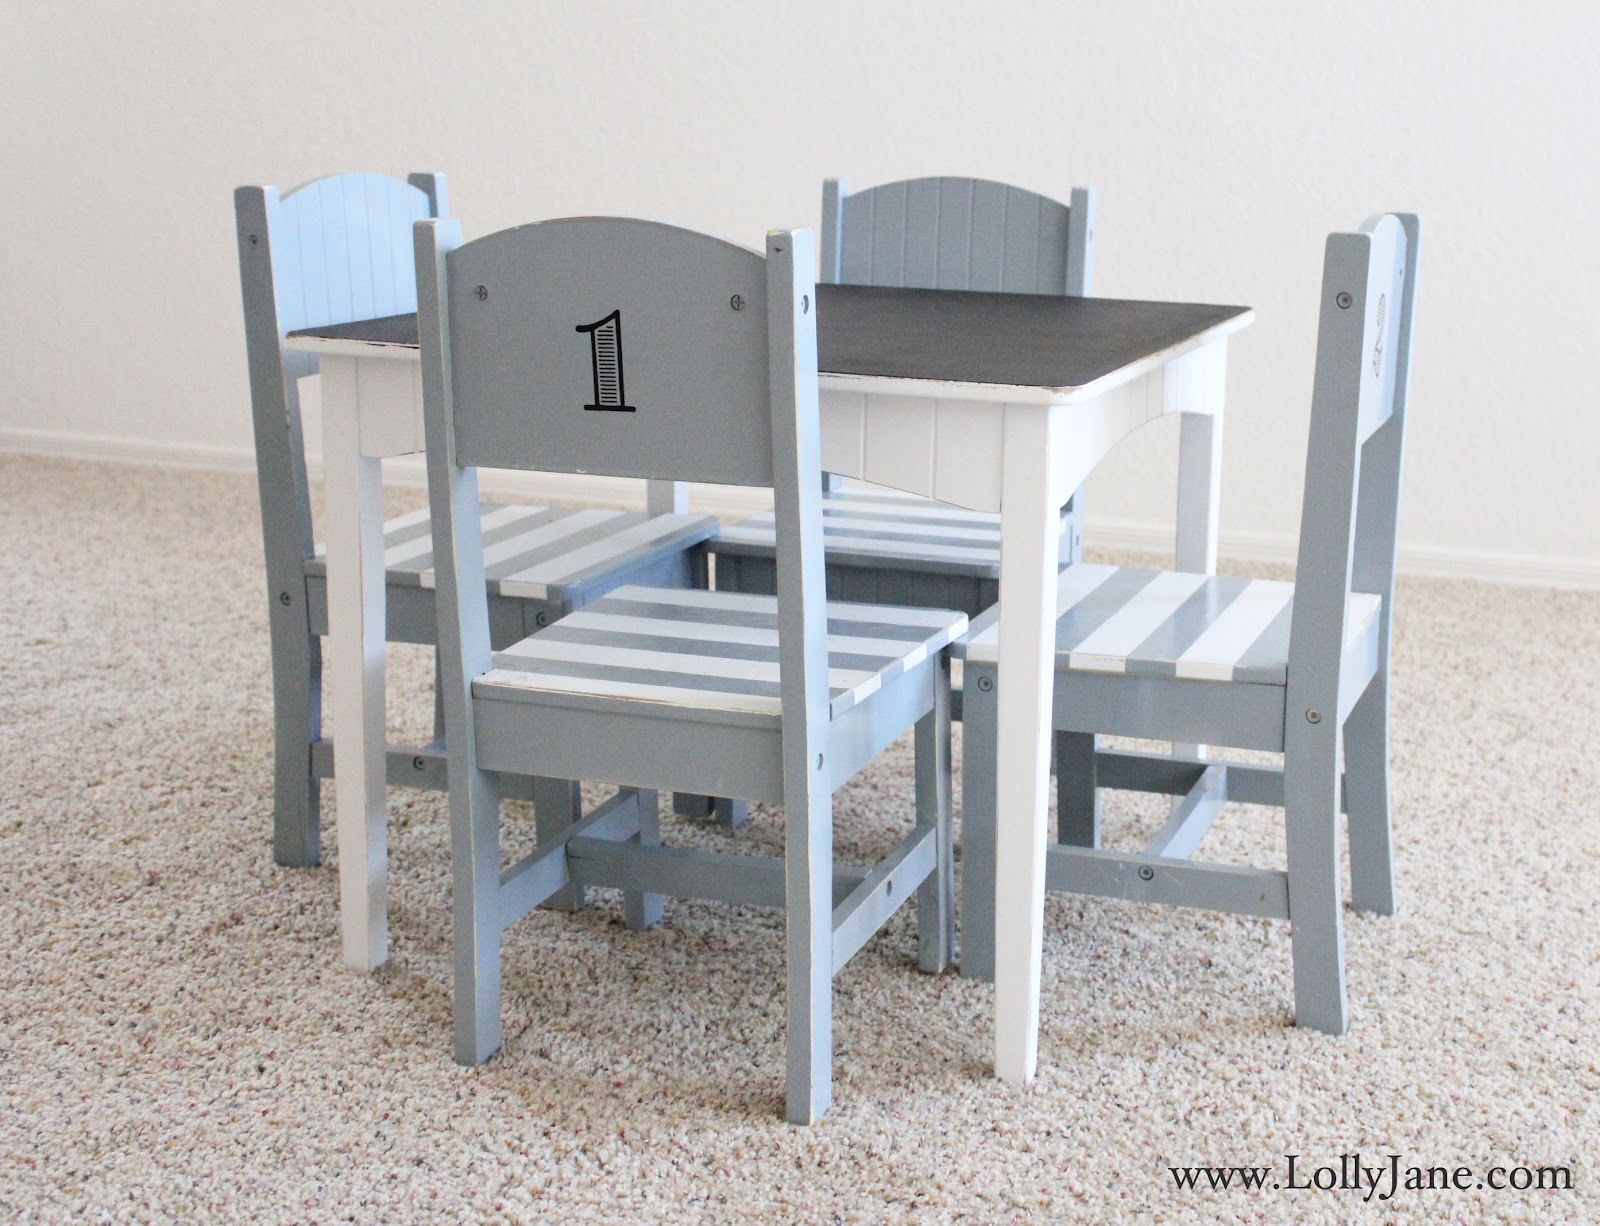 Refurbished Kids Play Table Kids Table Chair Set Diy Kids Table